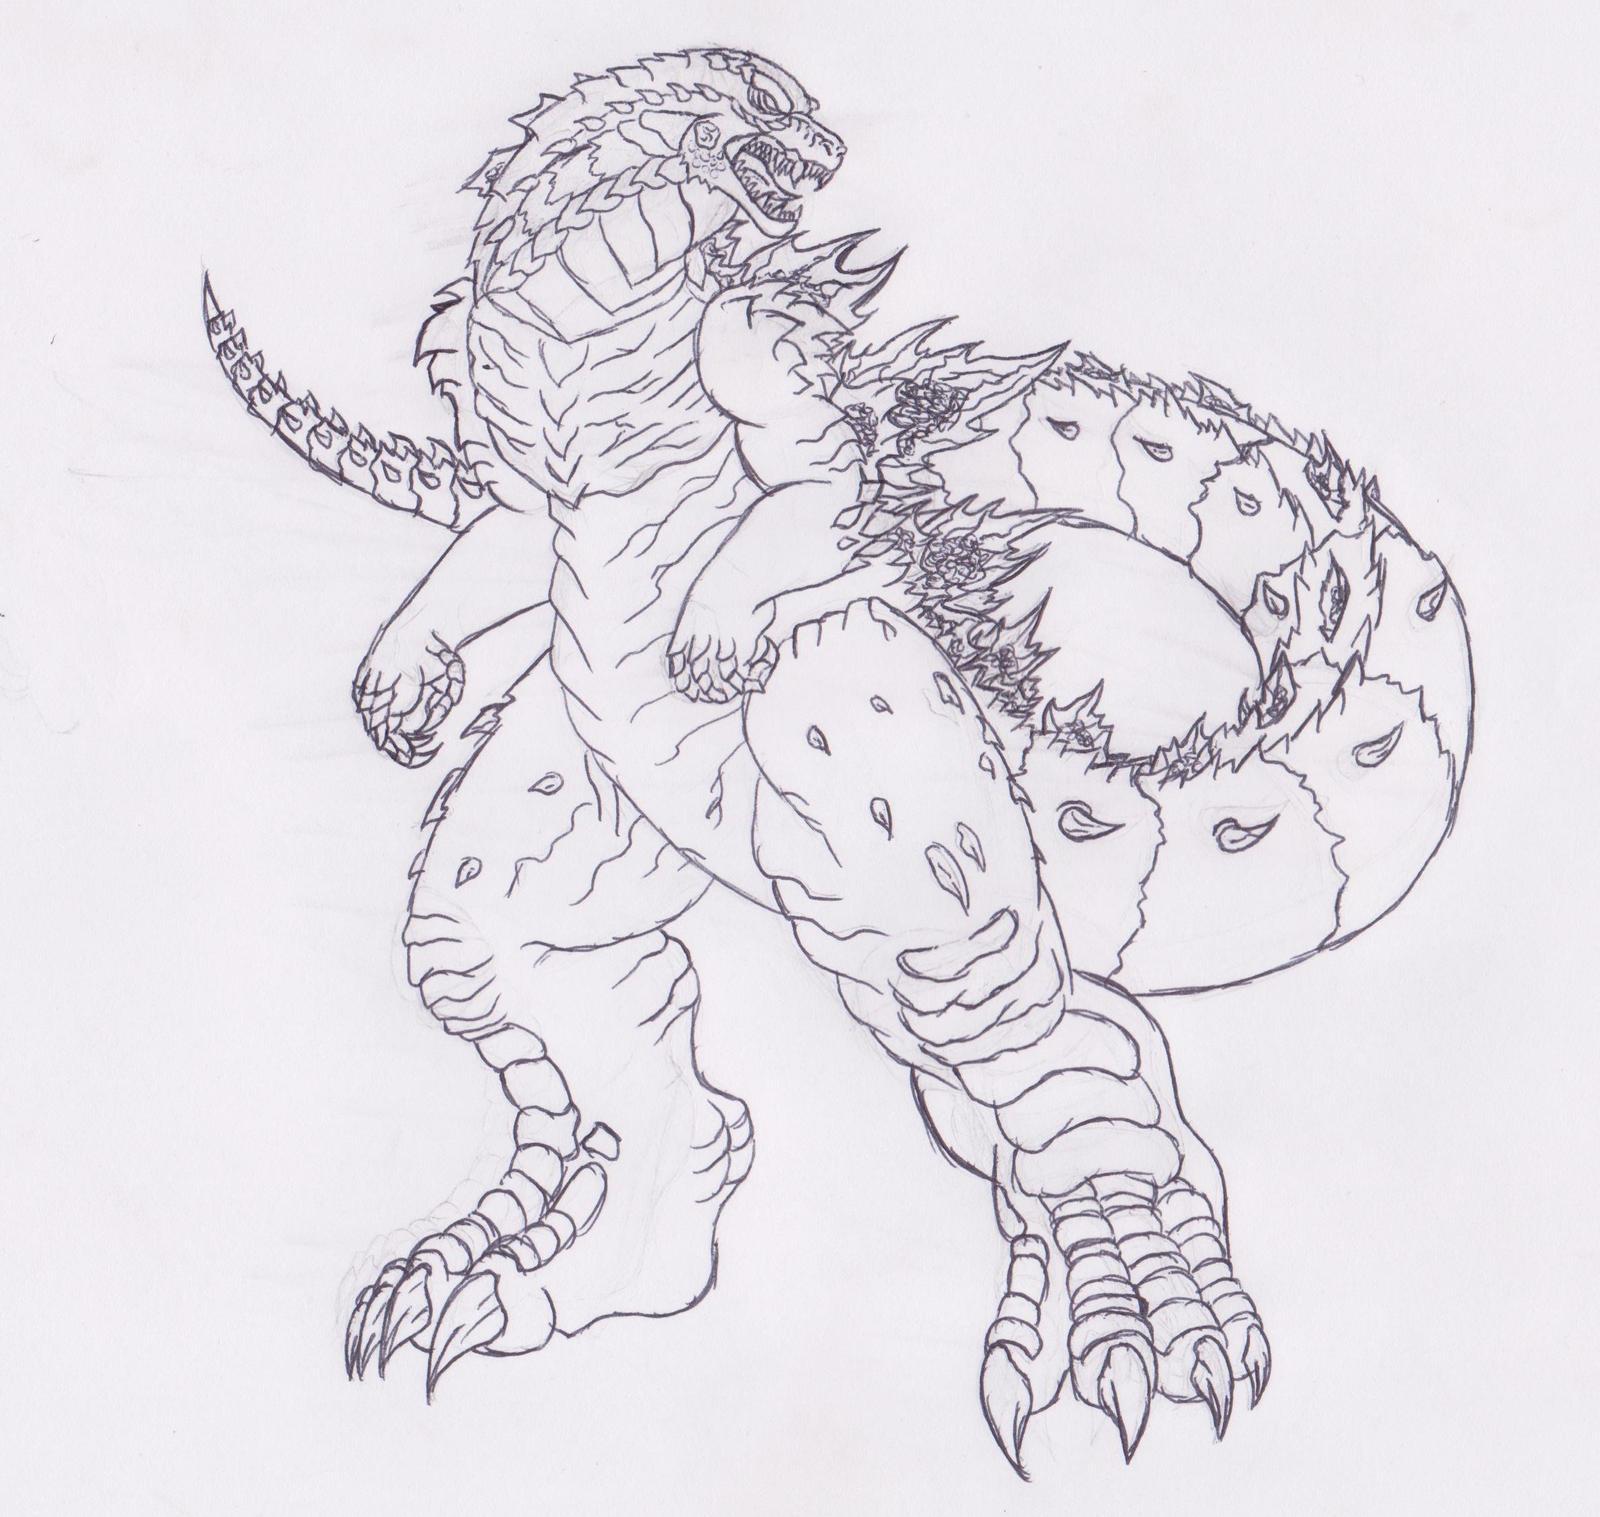 my fan made design of Godzilla 2014 by Pyrus-Leonidas